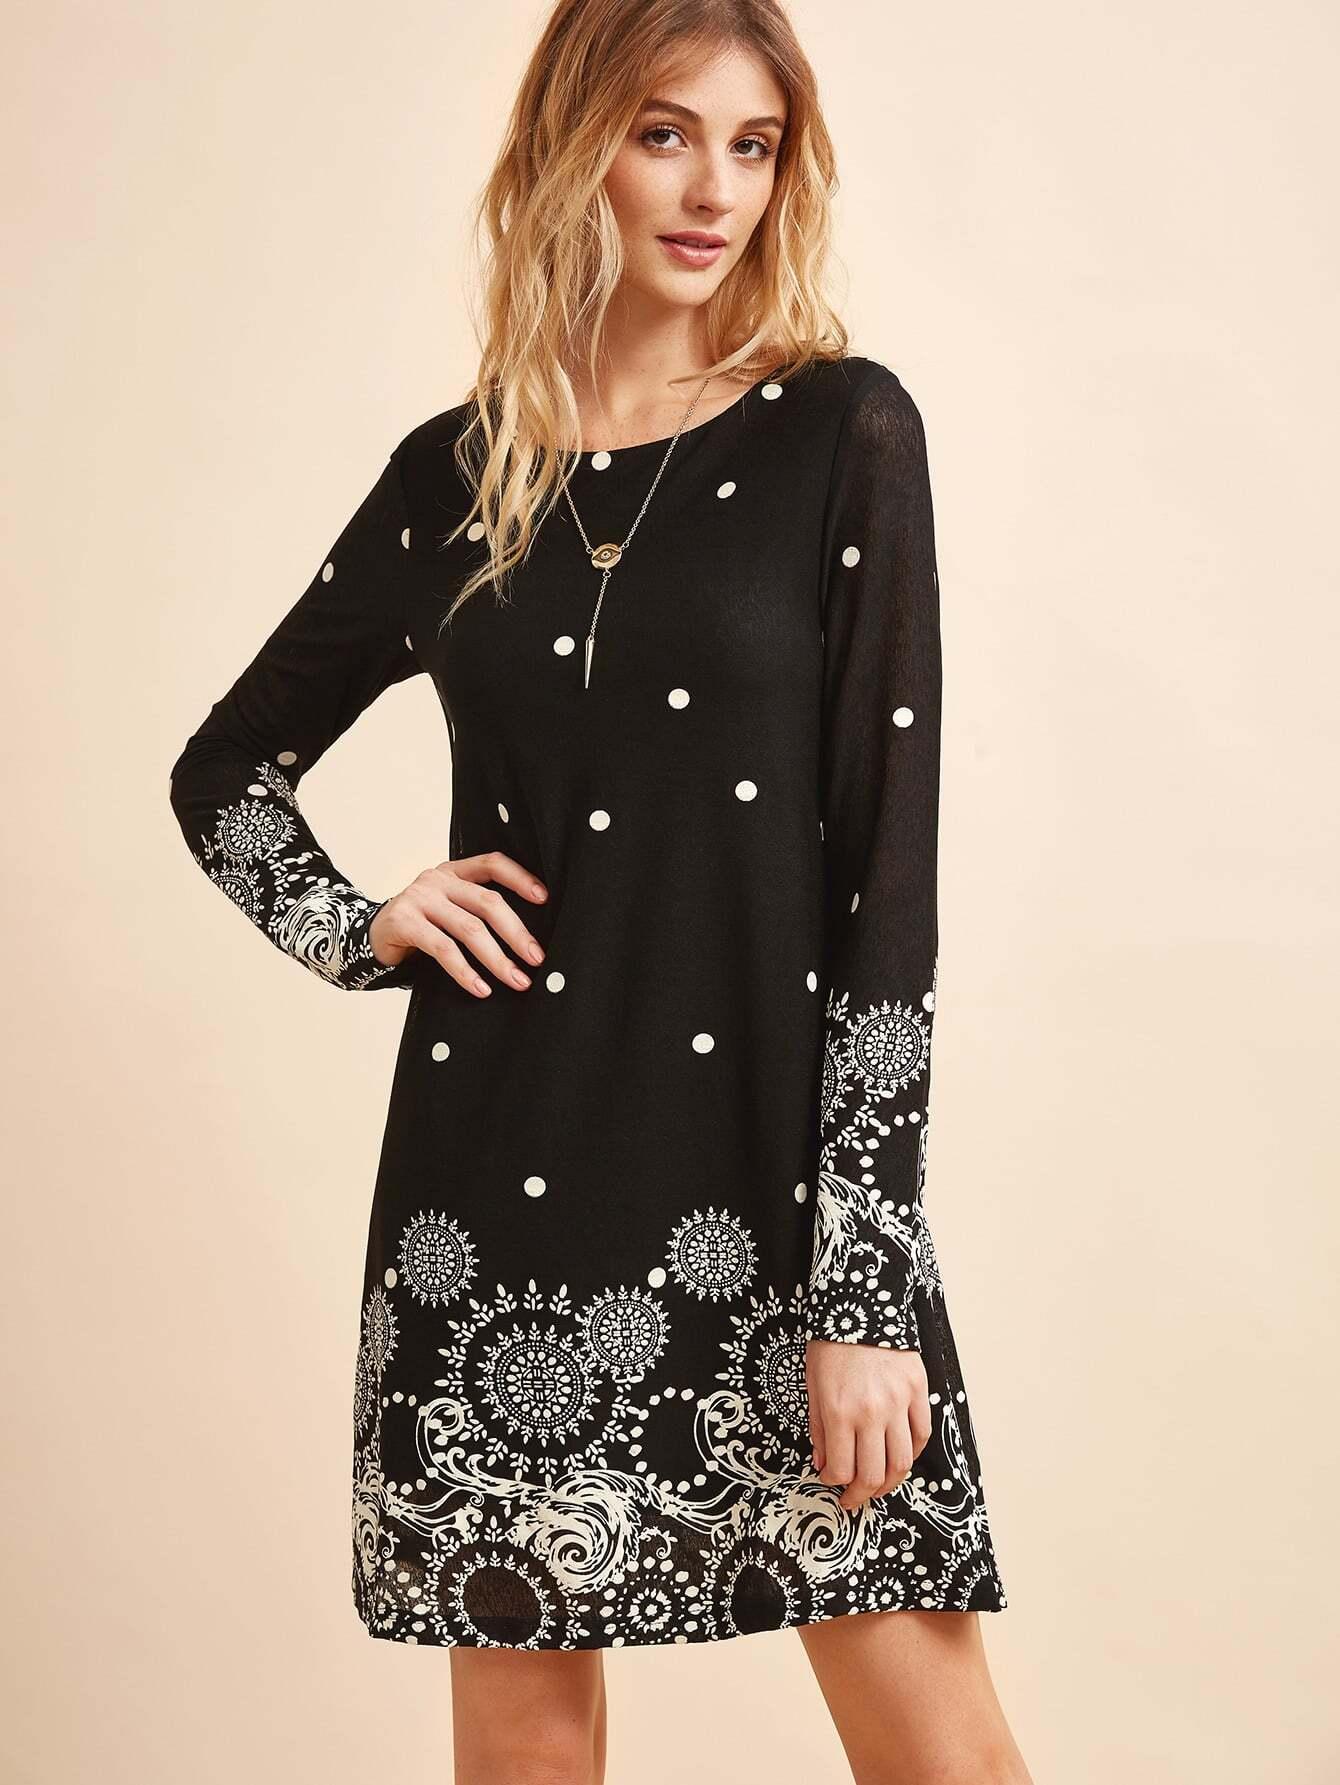 Retro Circle Amp Polka Dot Print Tunic Dress Shein Sheinside